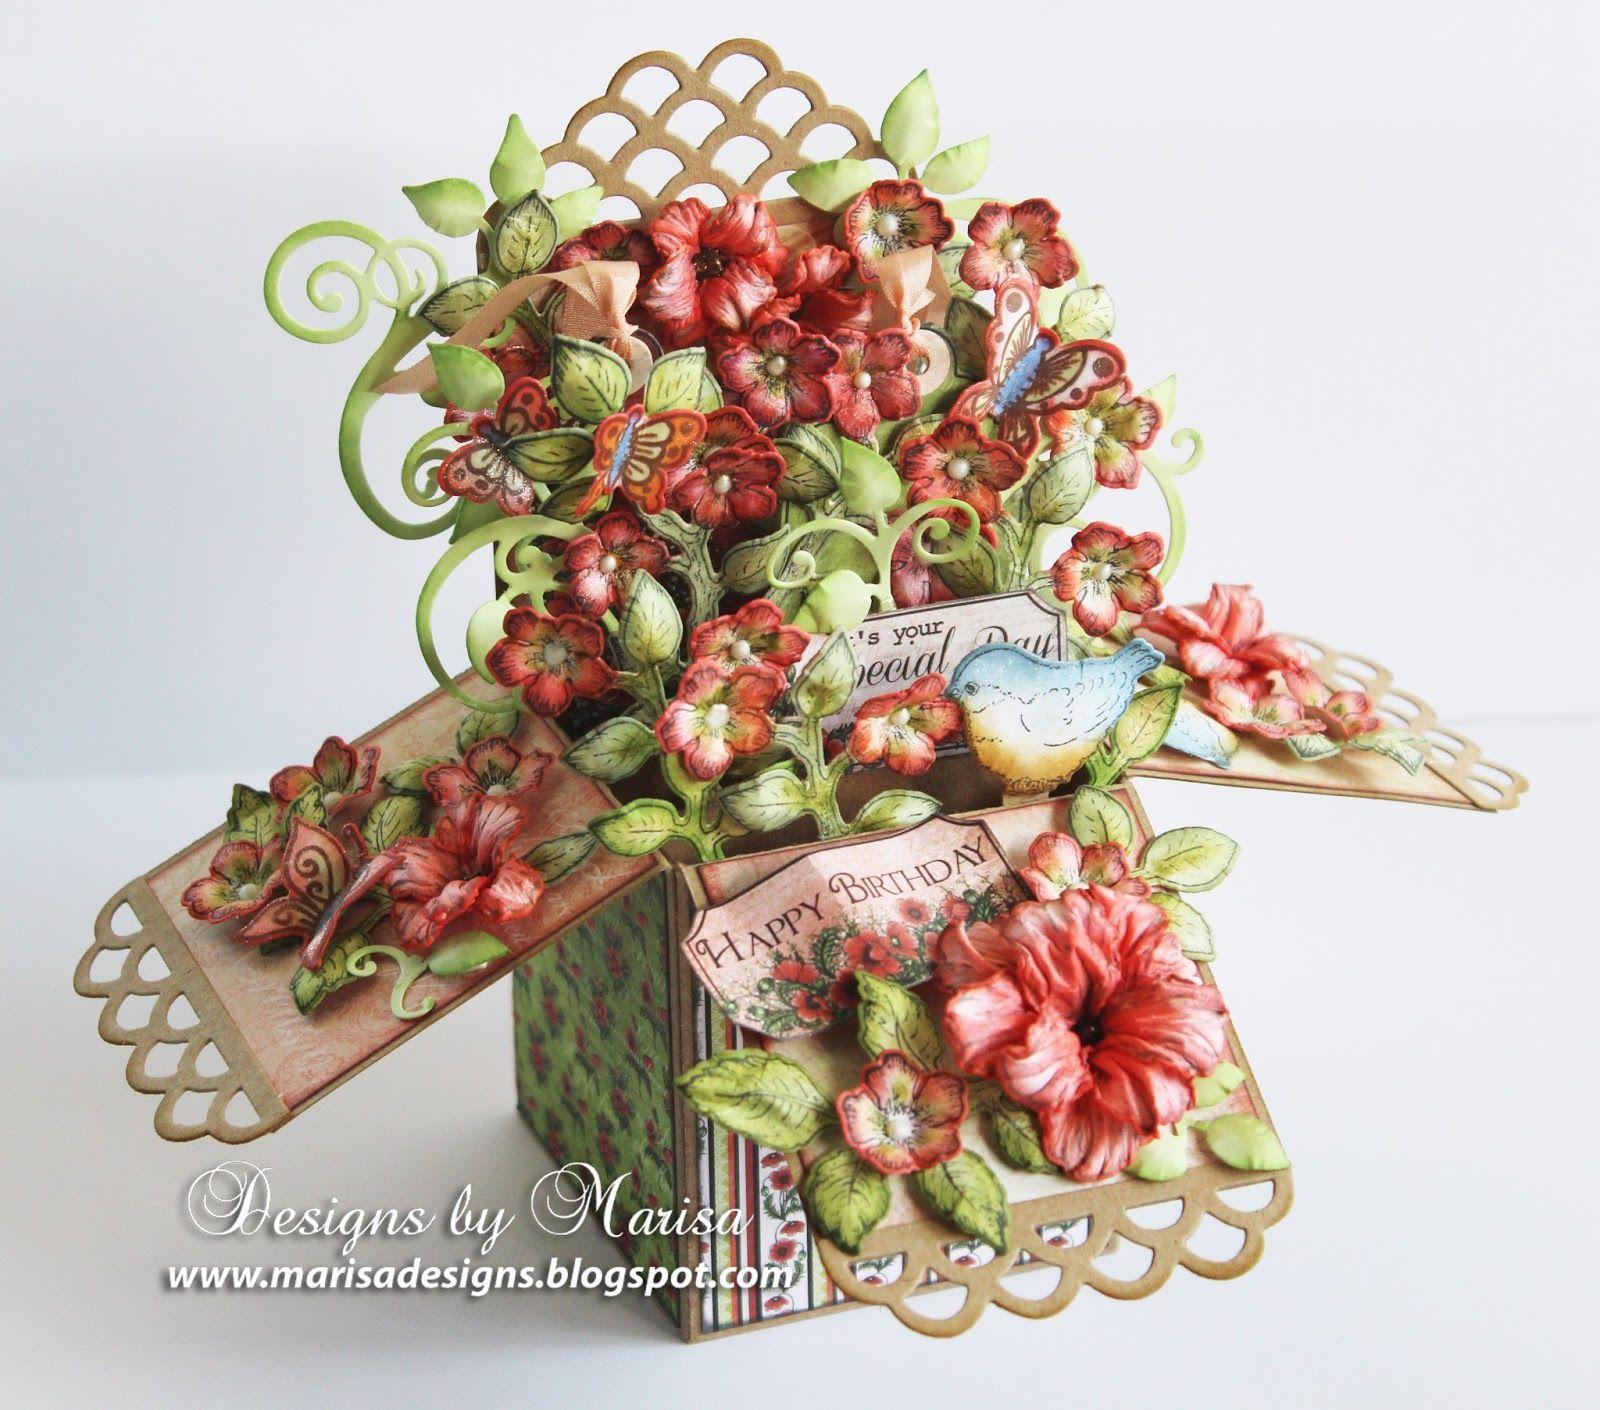 Designs by Marisa Heartfelt Creations Happy Birthday Pop Up Box – Boxed Cards Birthday